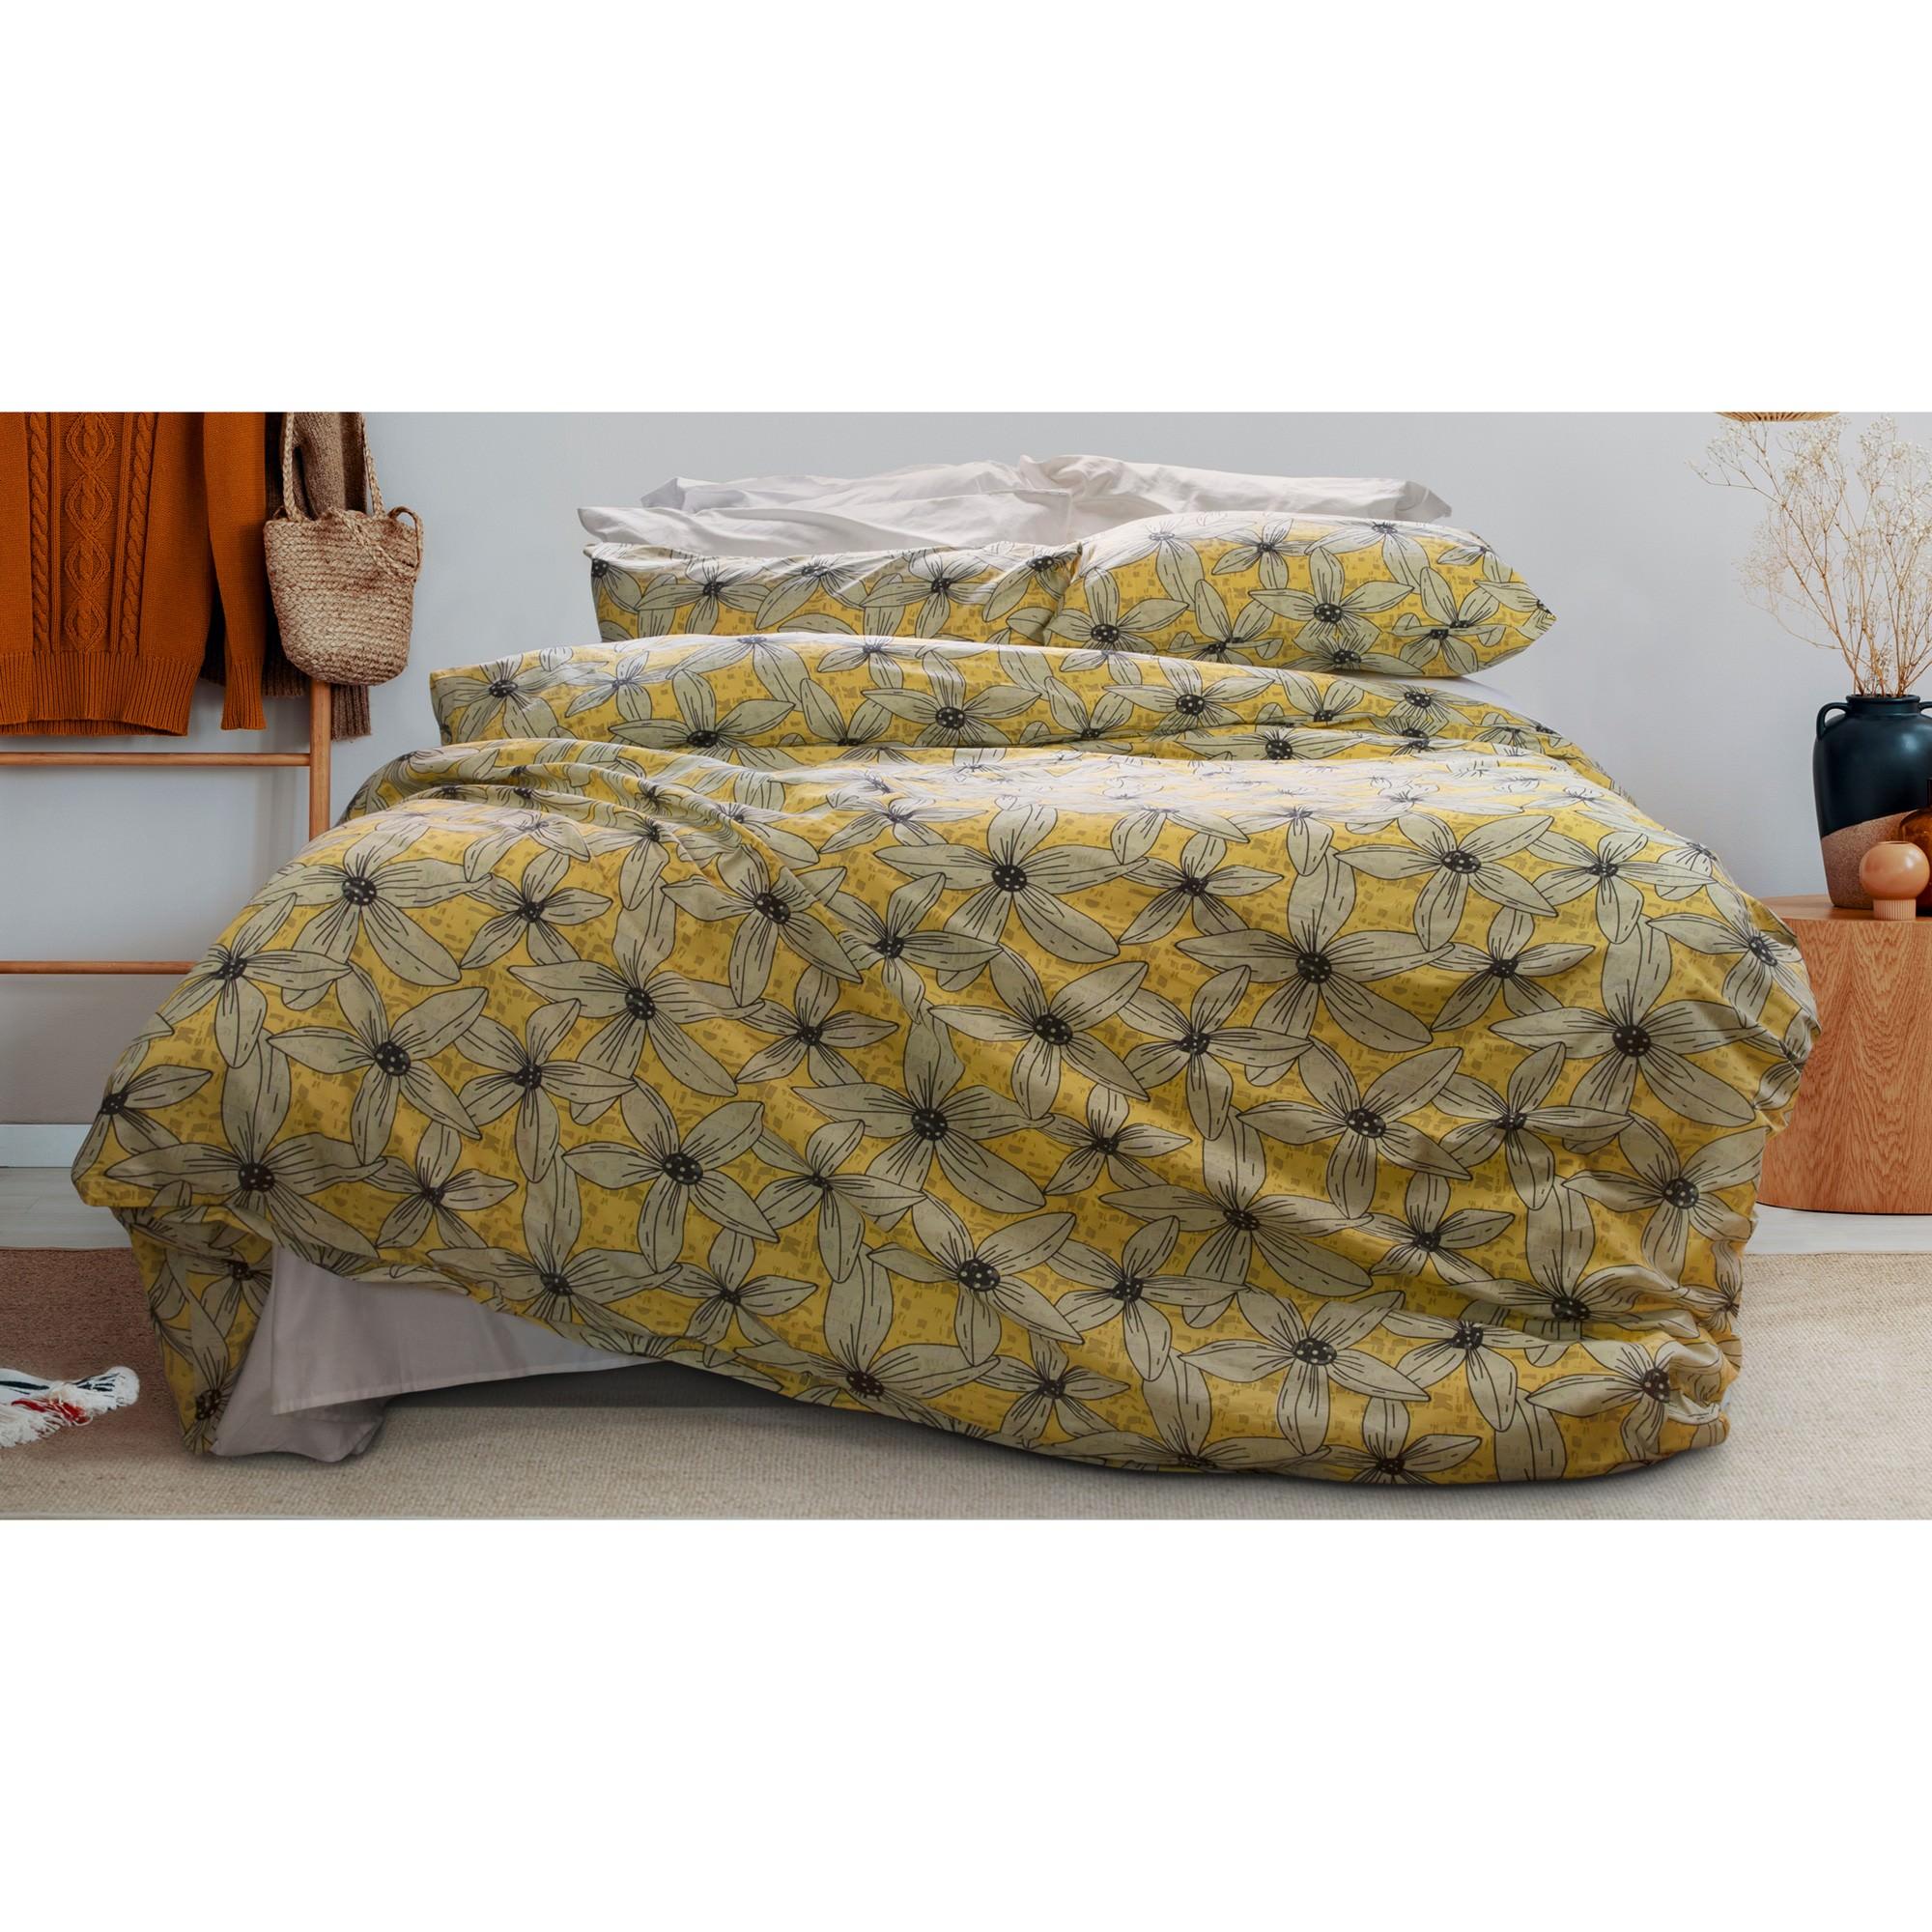 Lumiosa 3 Piece Cotton Quilt Cover Set, Queen